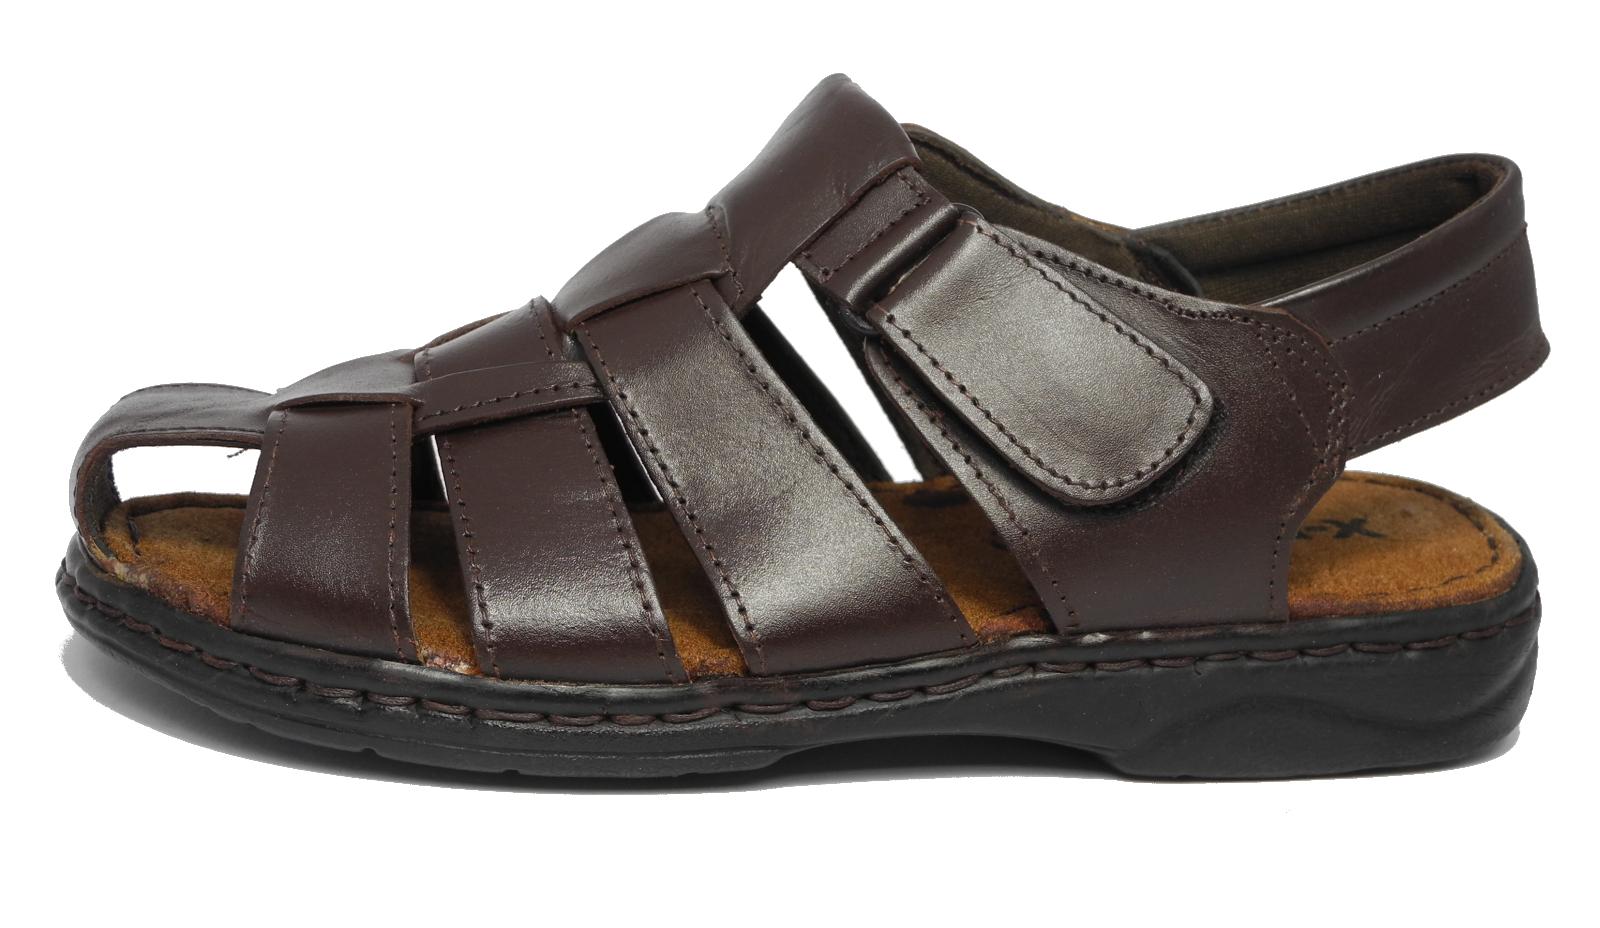 Flip Flop Comfort Closed Toe Shoes For Men